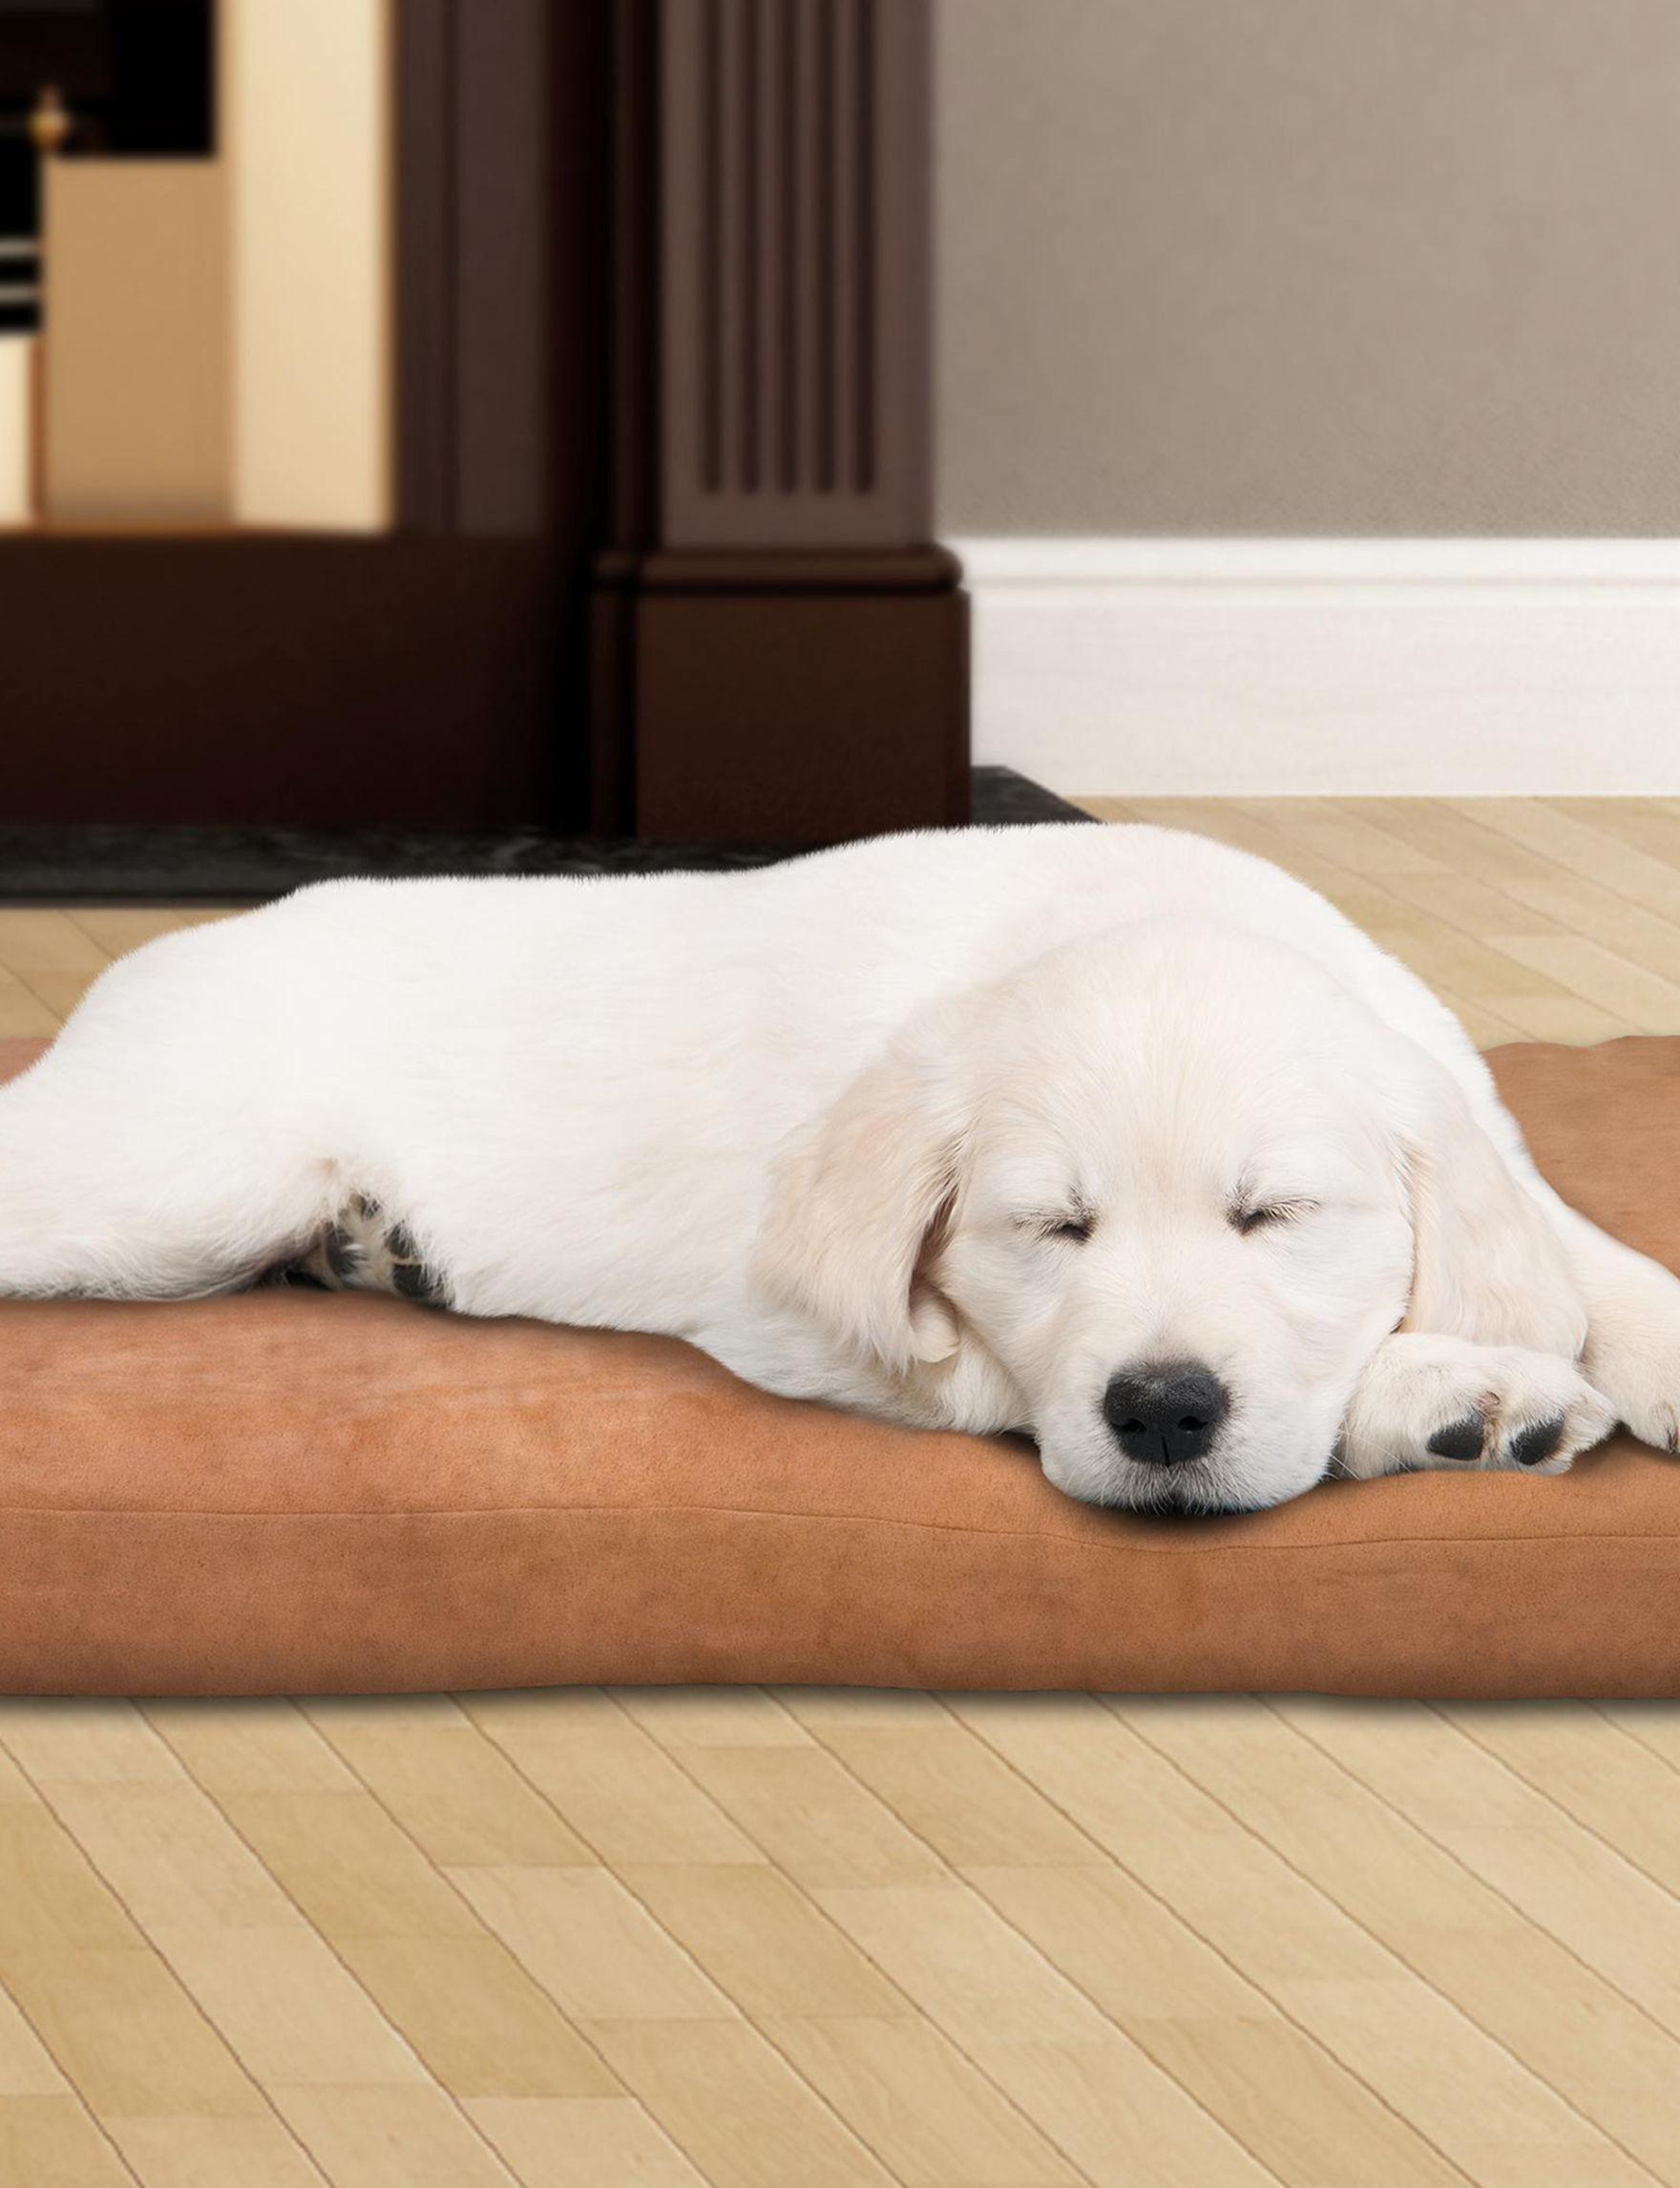 Petmaker Khaki Pet Beds & Houses